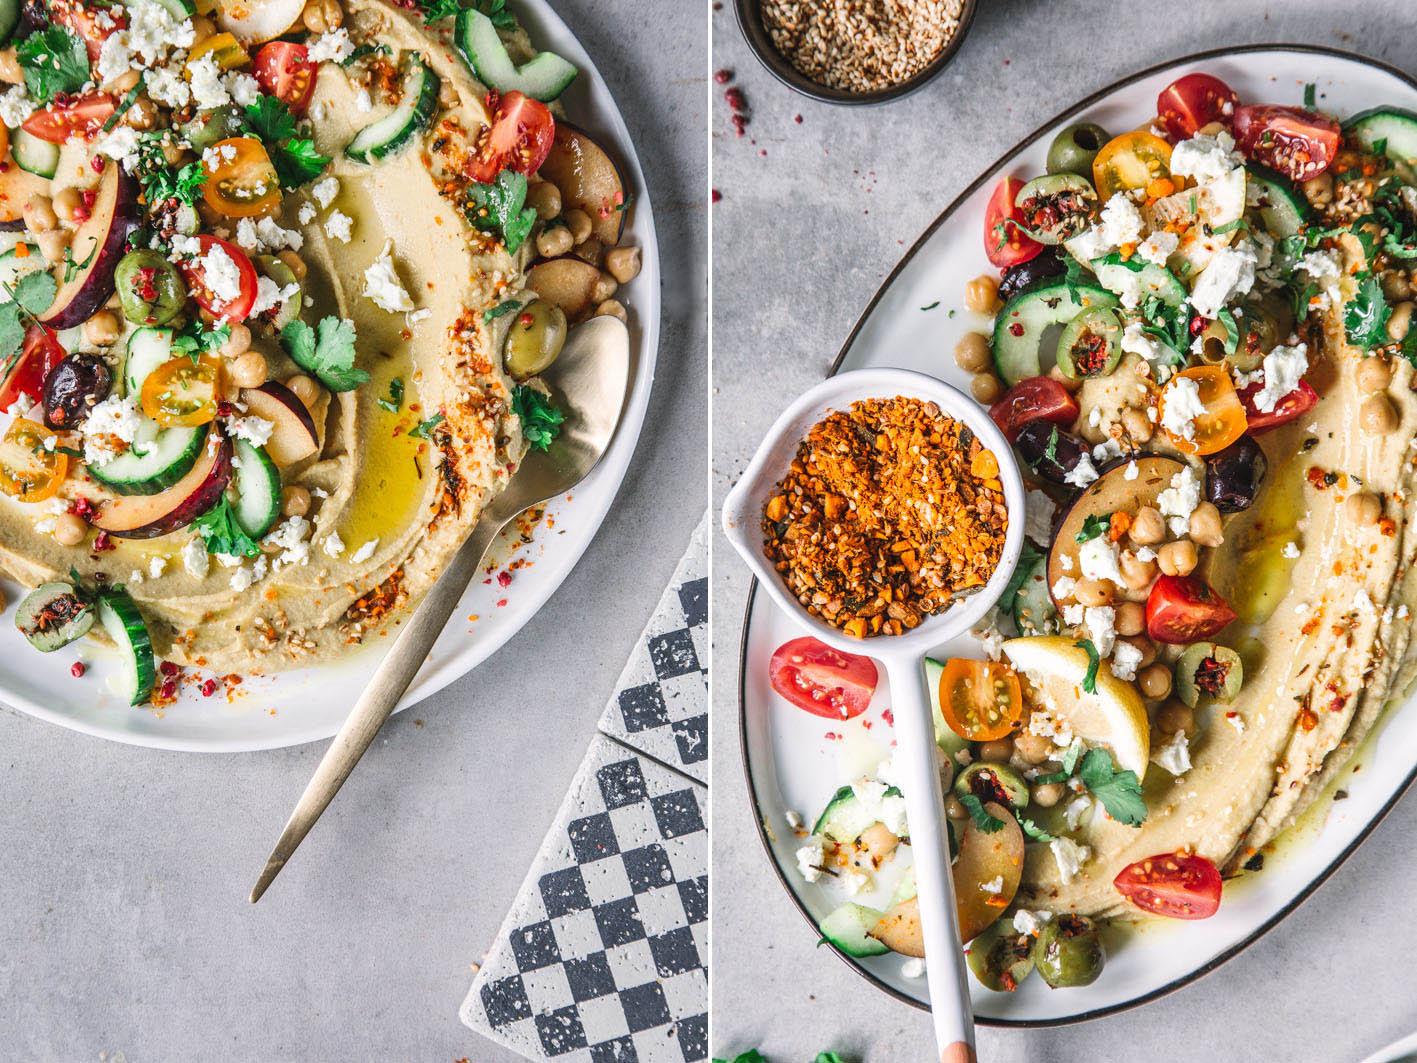 Cremiger Hummus mit verschiedenen Toppings